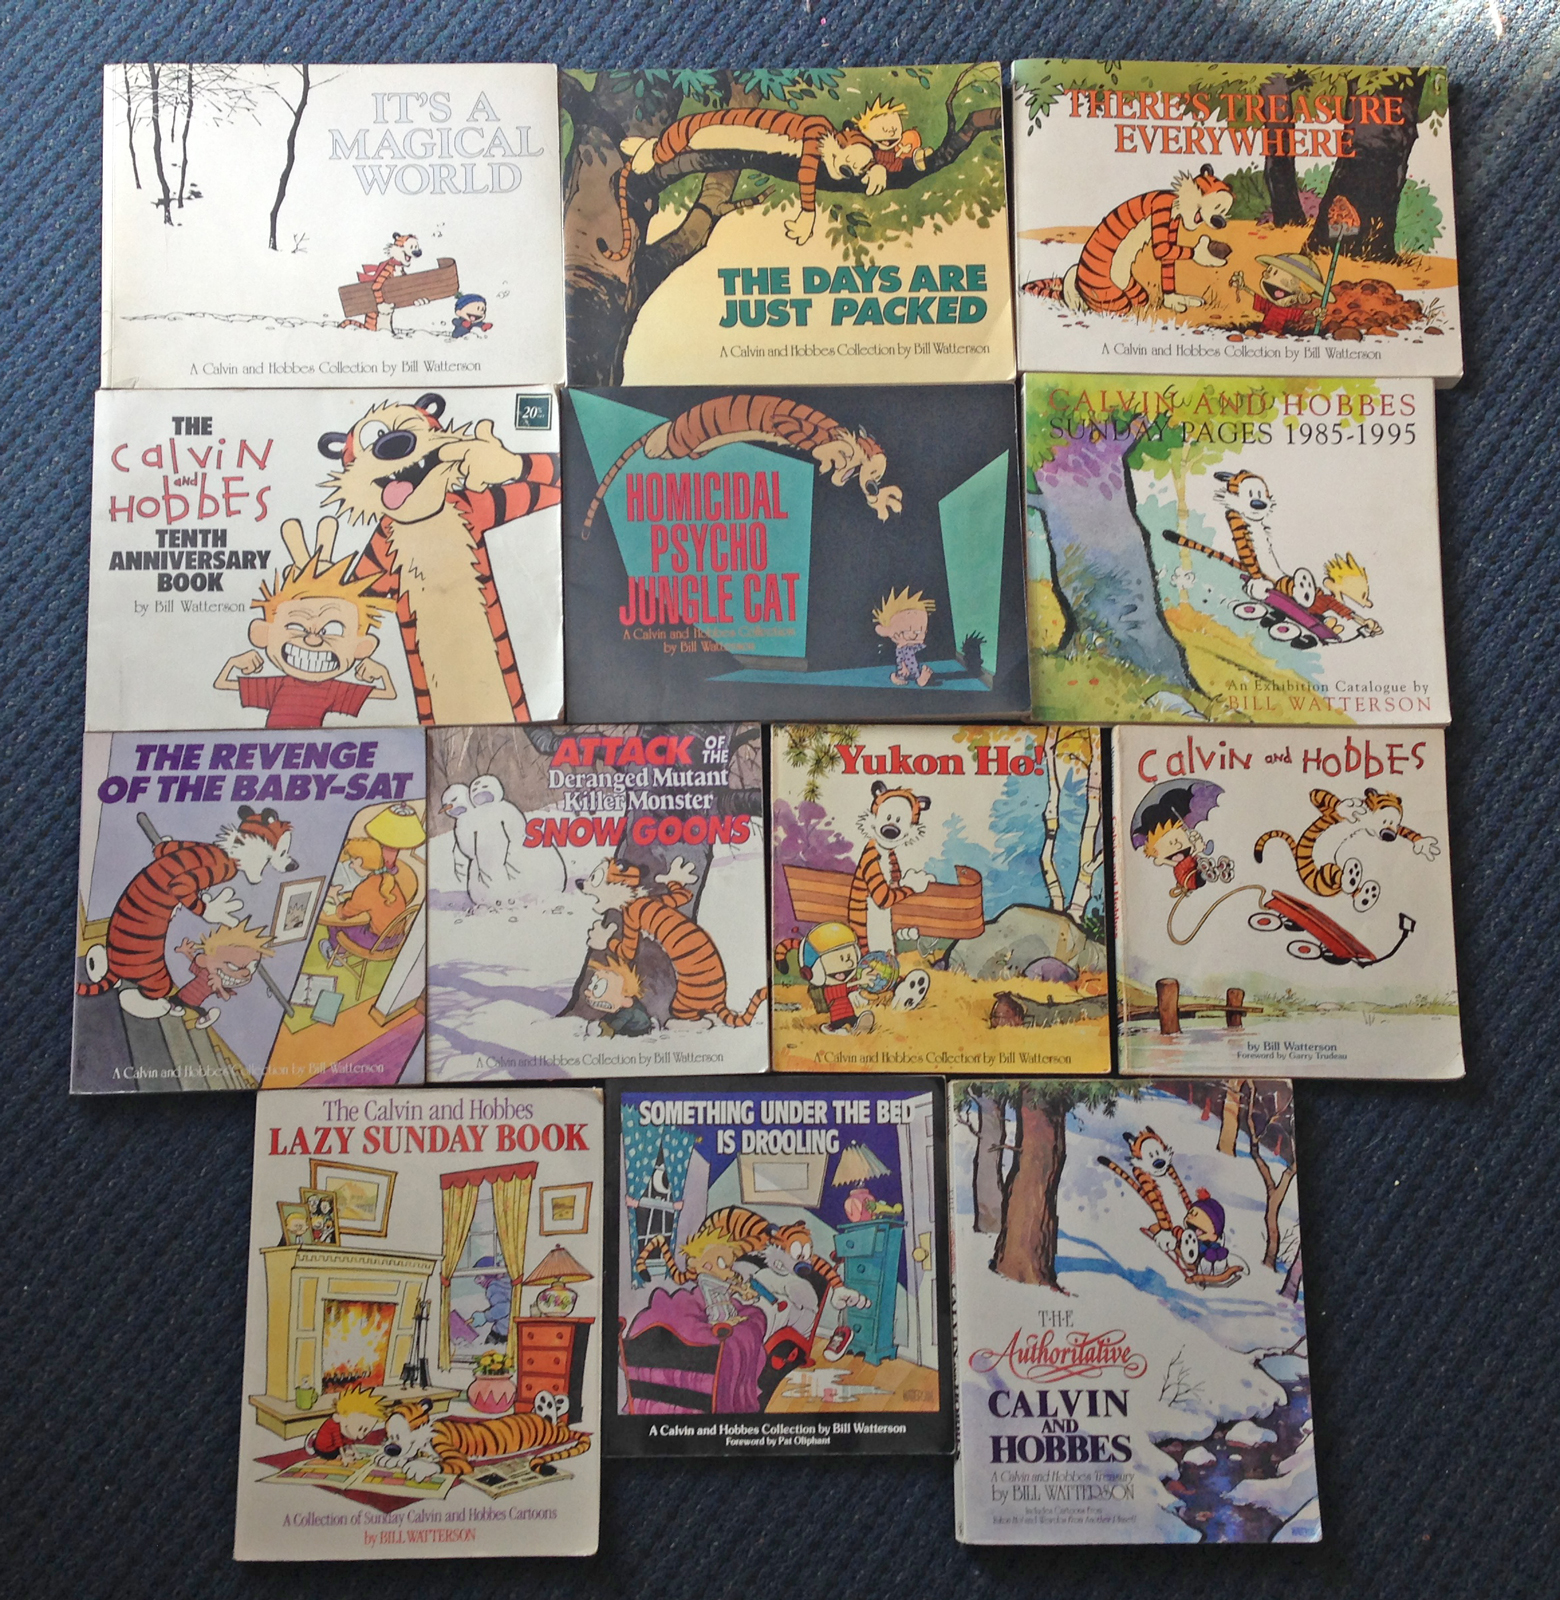 Studio Stuff/Influences: Bill Watterson's Calvin and Hobbes